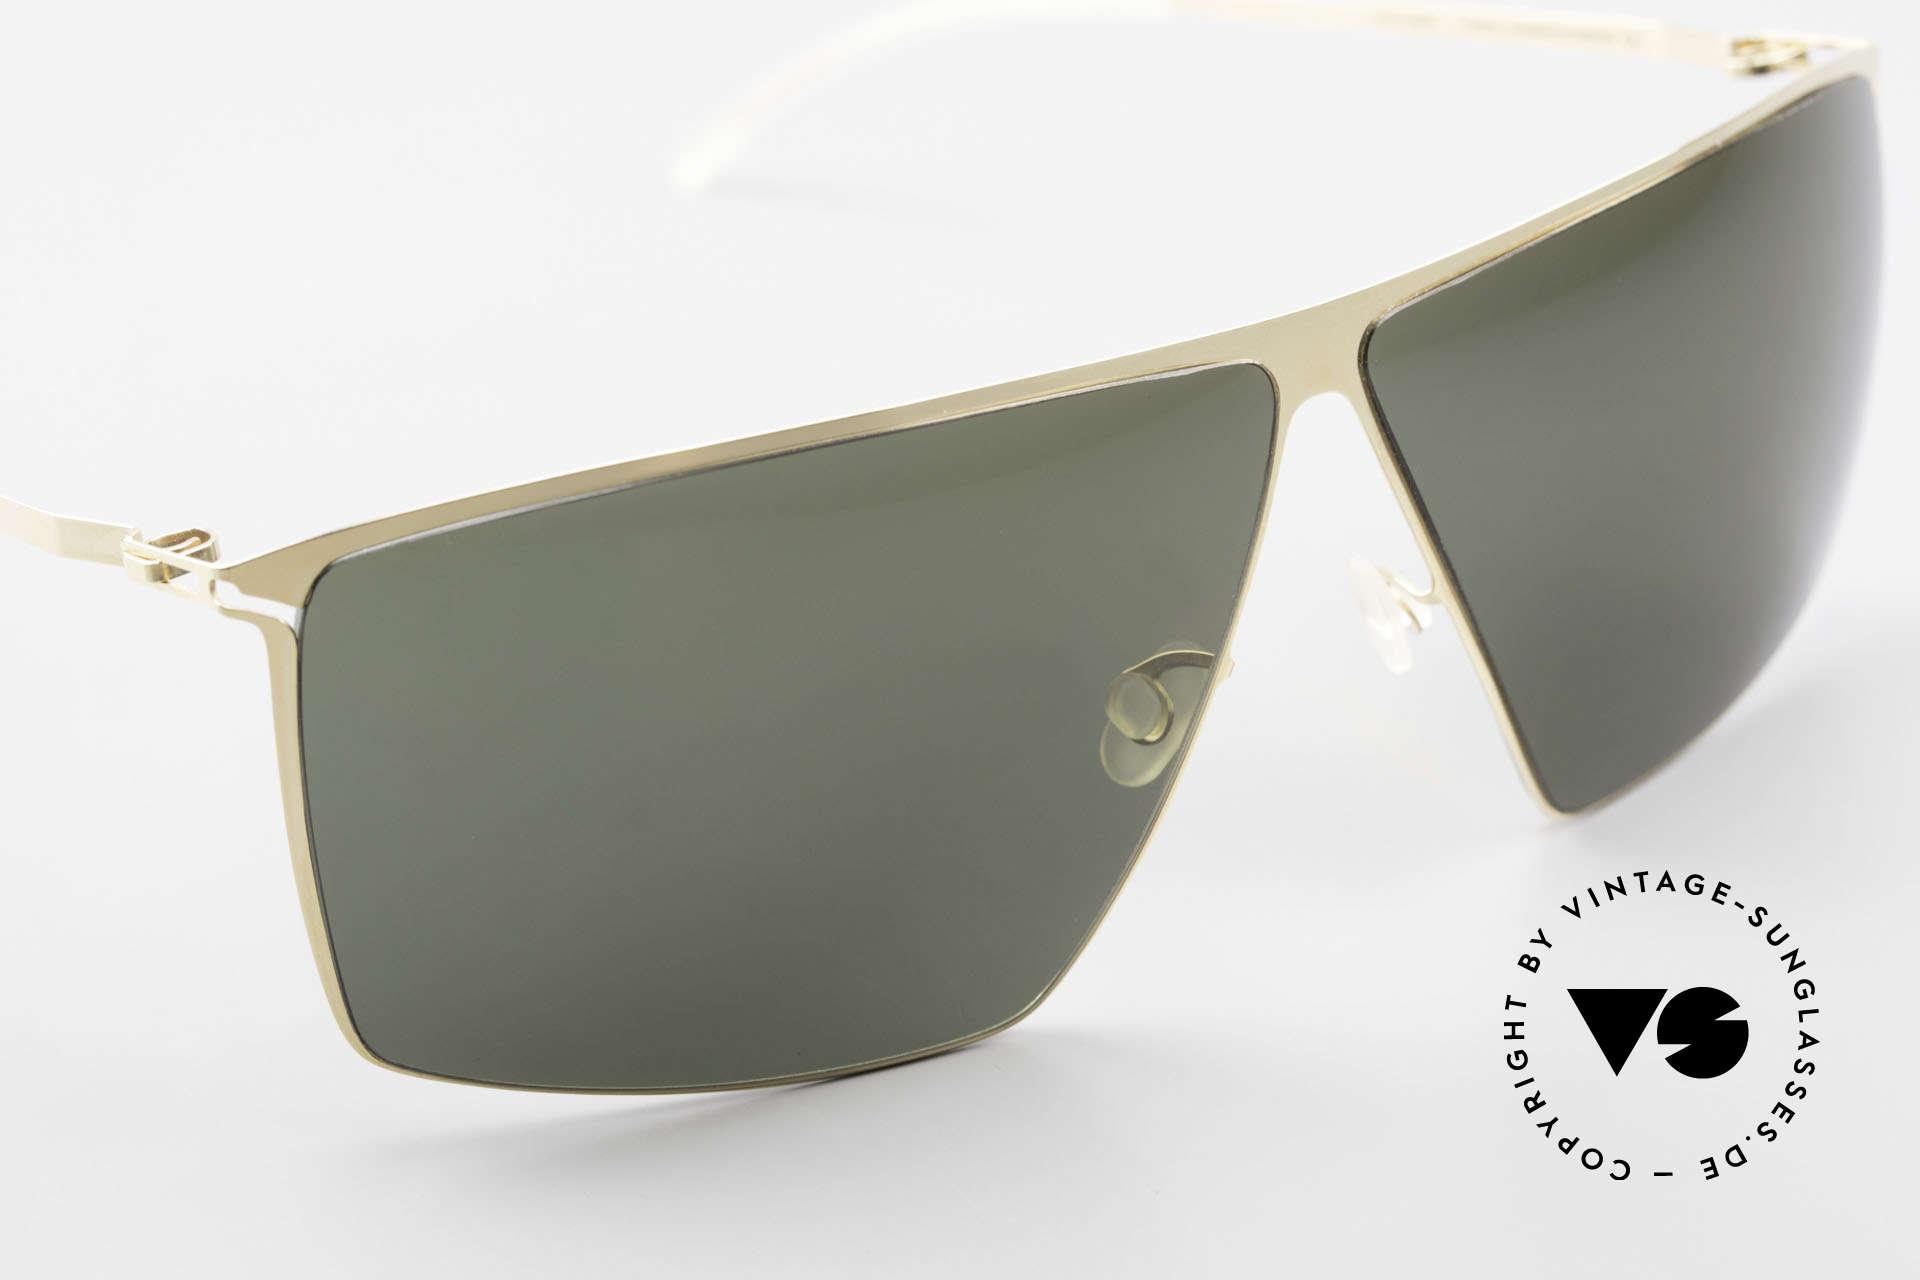 Mykita Amund 2010's Designer Sunglasses Men, top-notch quality, made in Germany (Berlin-Kreuzberg), Made for Men